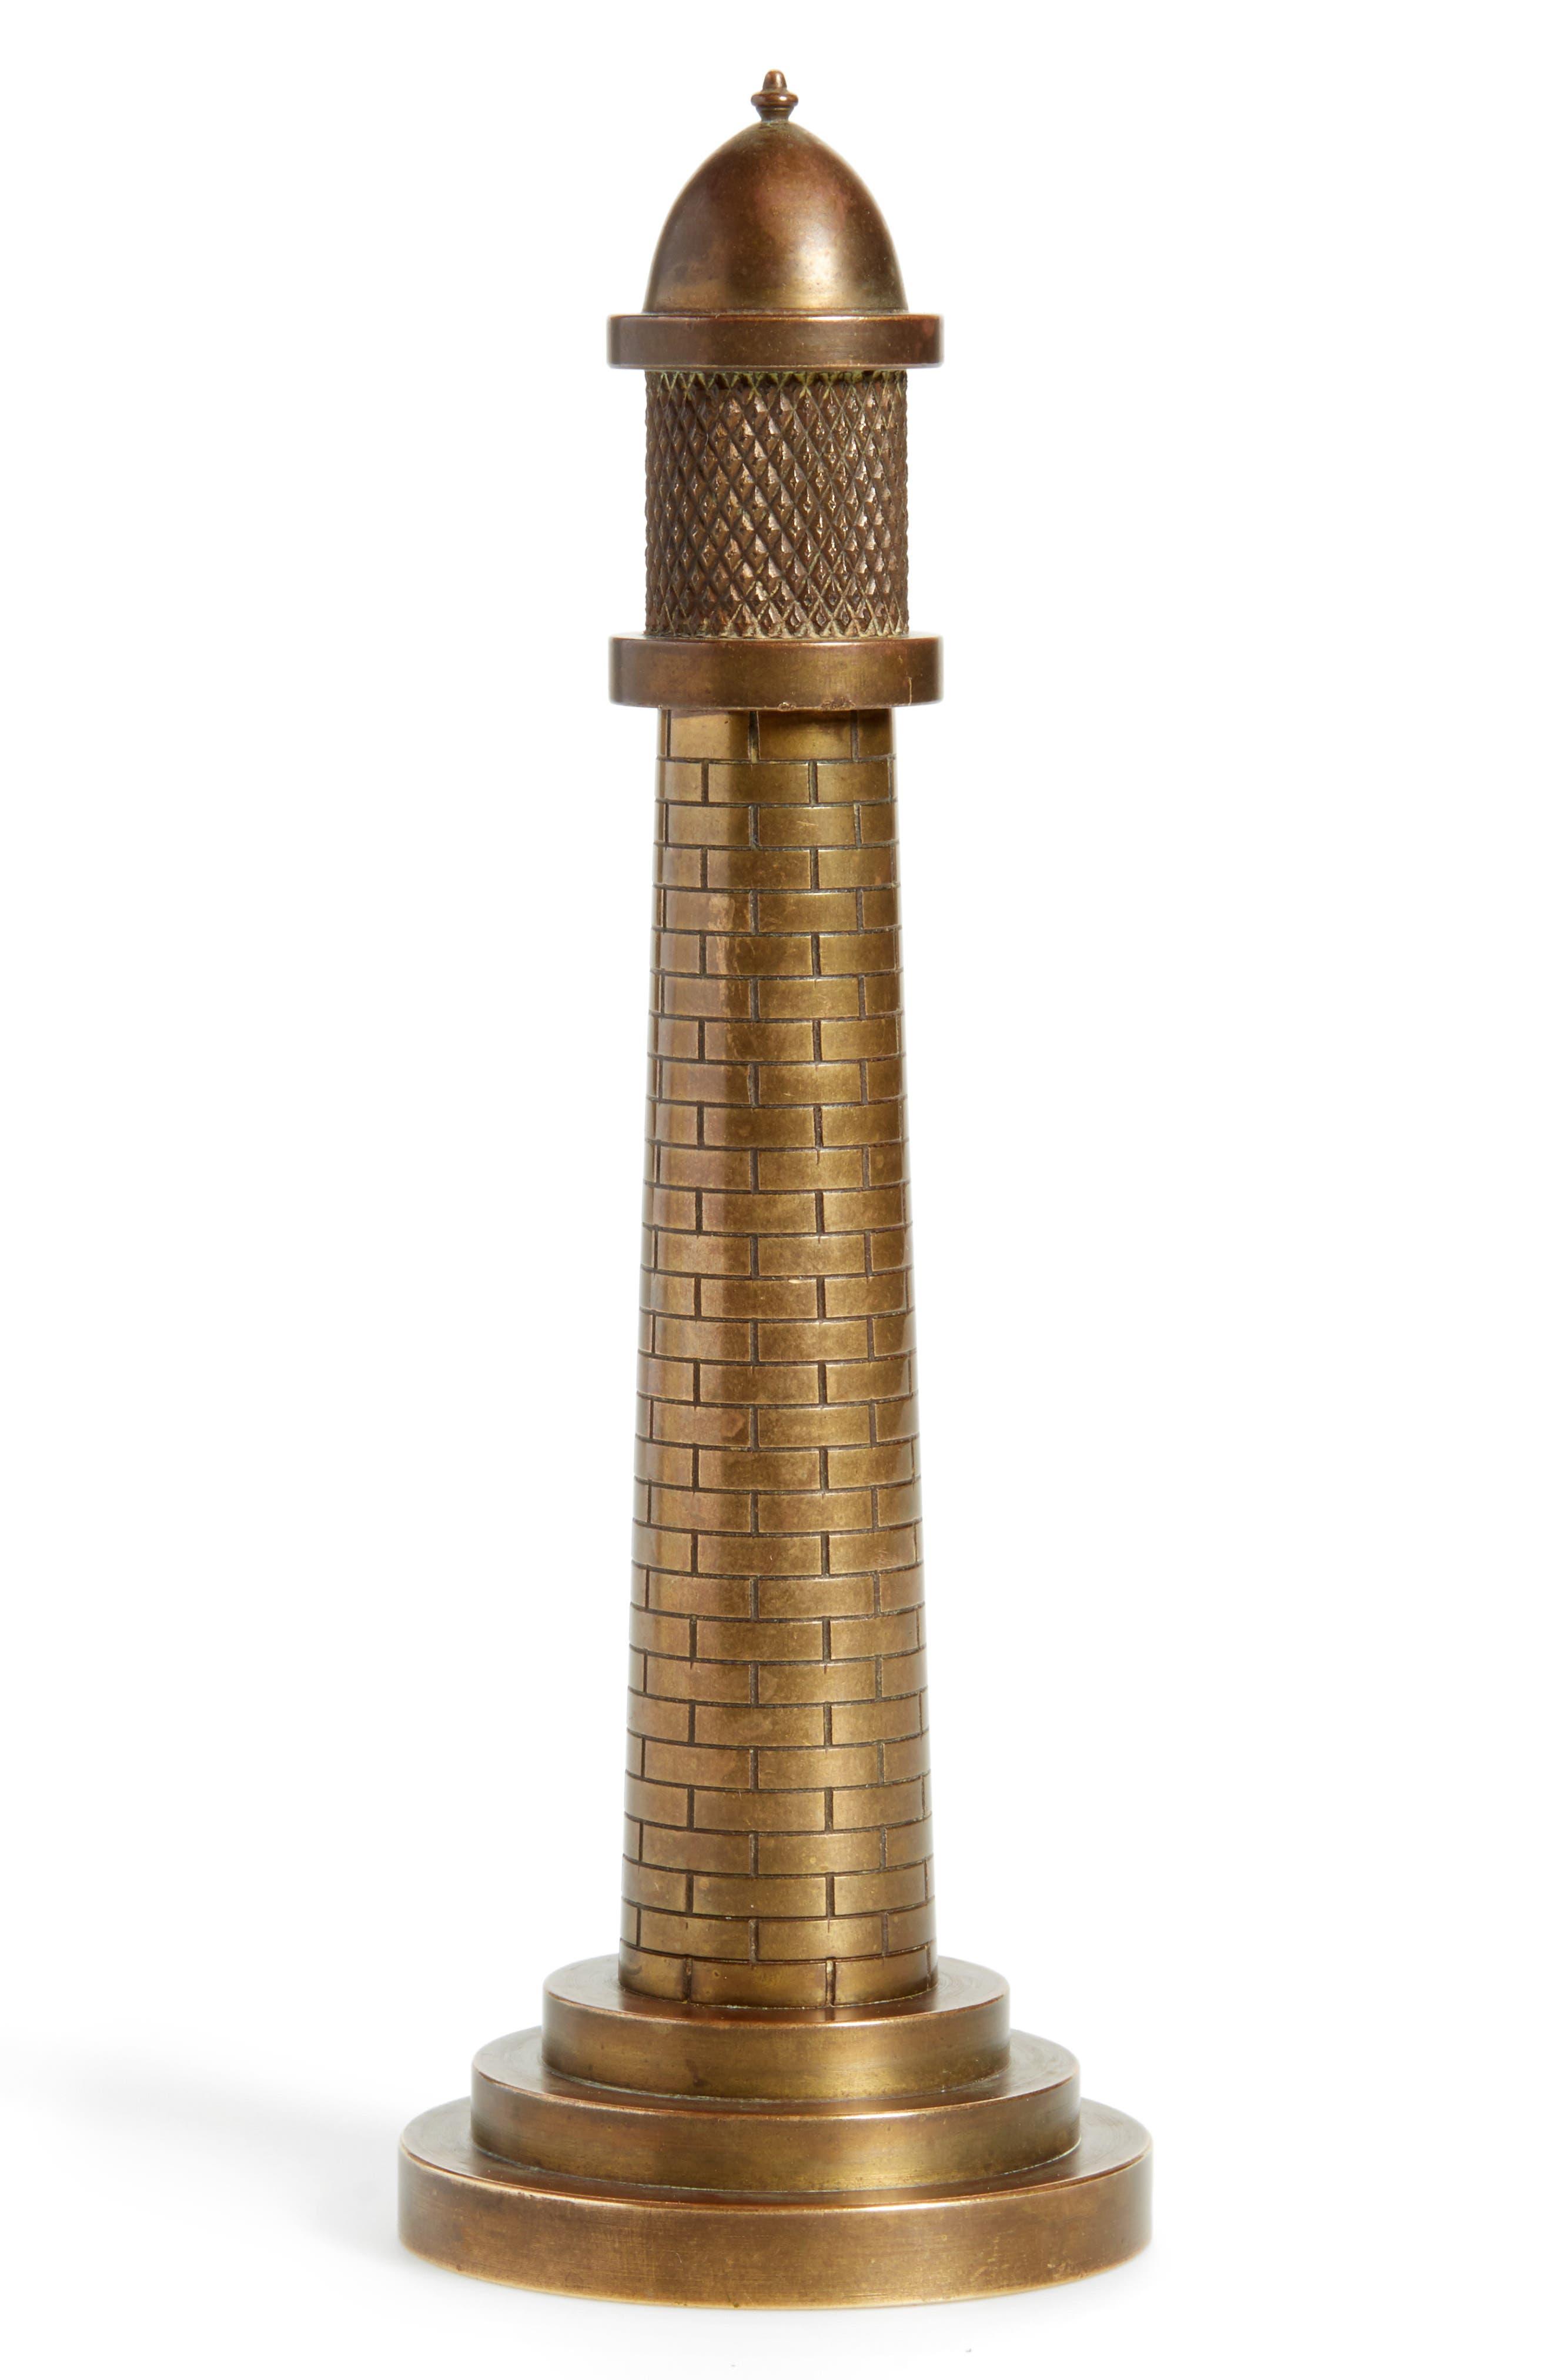 One of a Kind Vintage Brass Lighthouse Table Lighter,                         Main,                         color, BRONZE